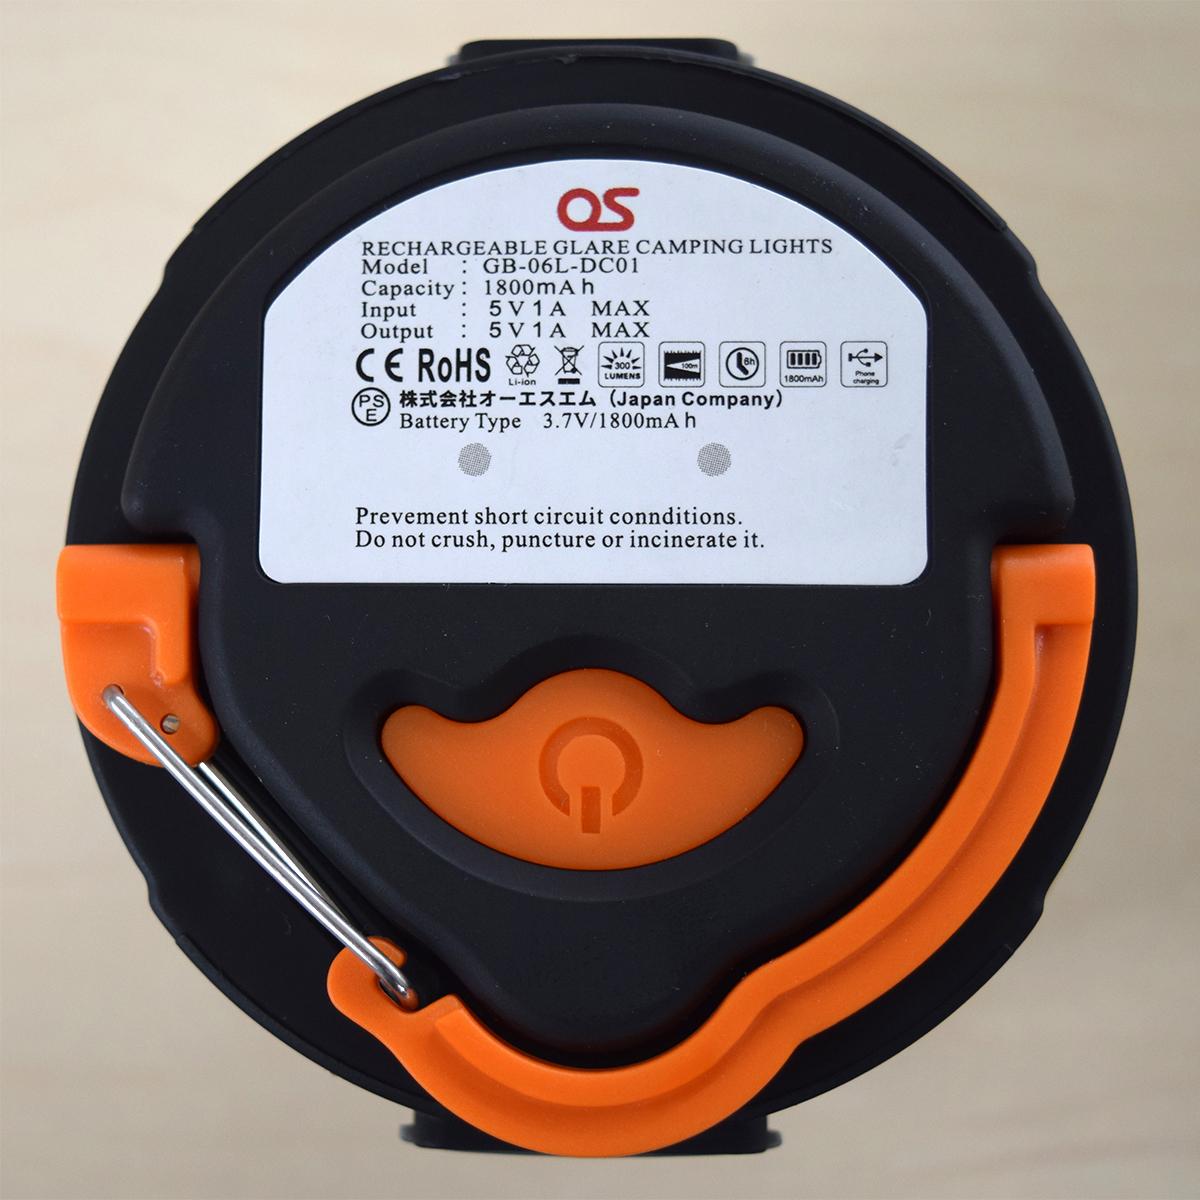 USB充電式LEDランタン/1800mAh モバイルバッテリー機能付 OS オーエス GB-06L-DC01